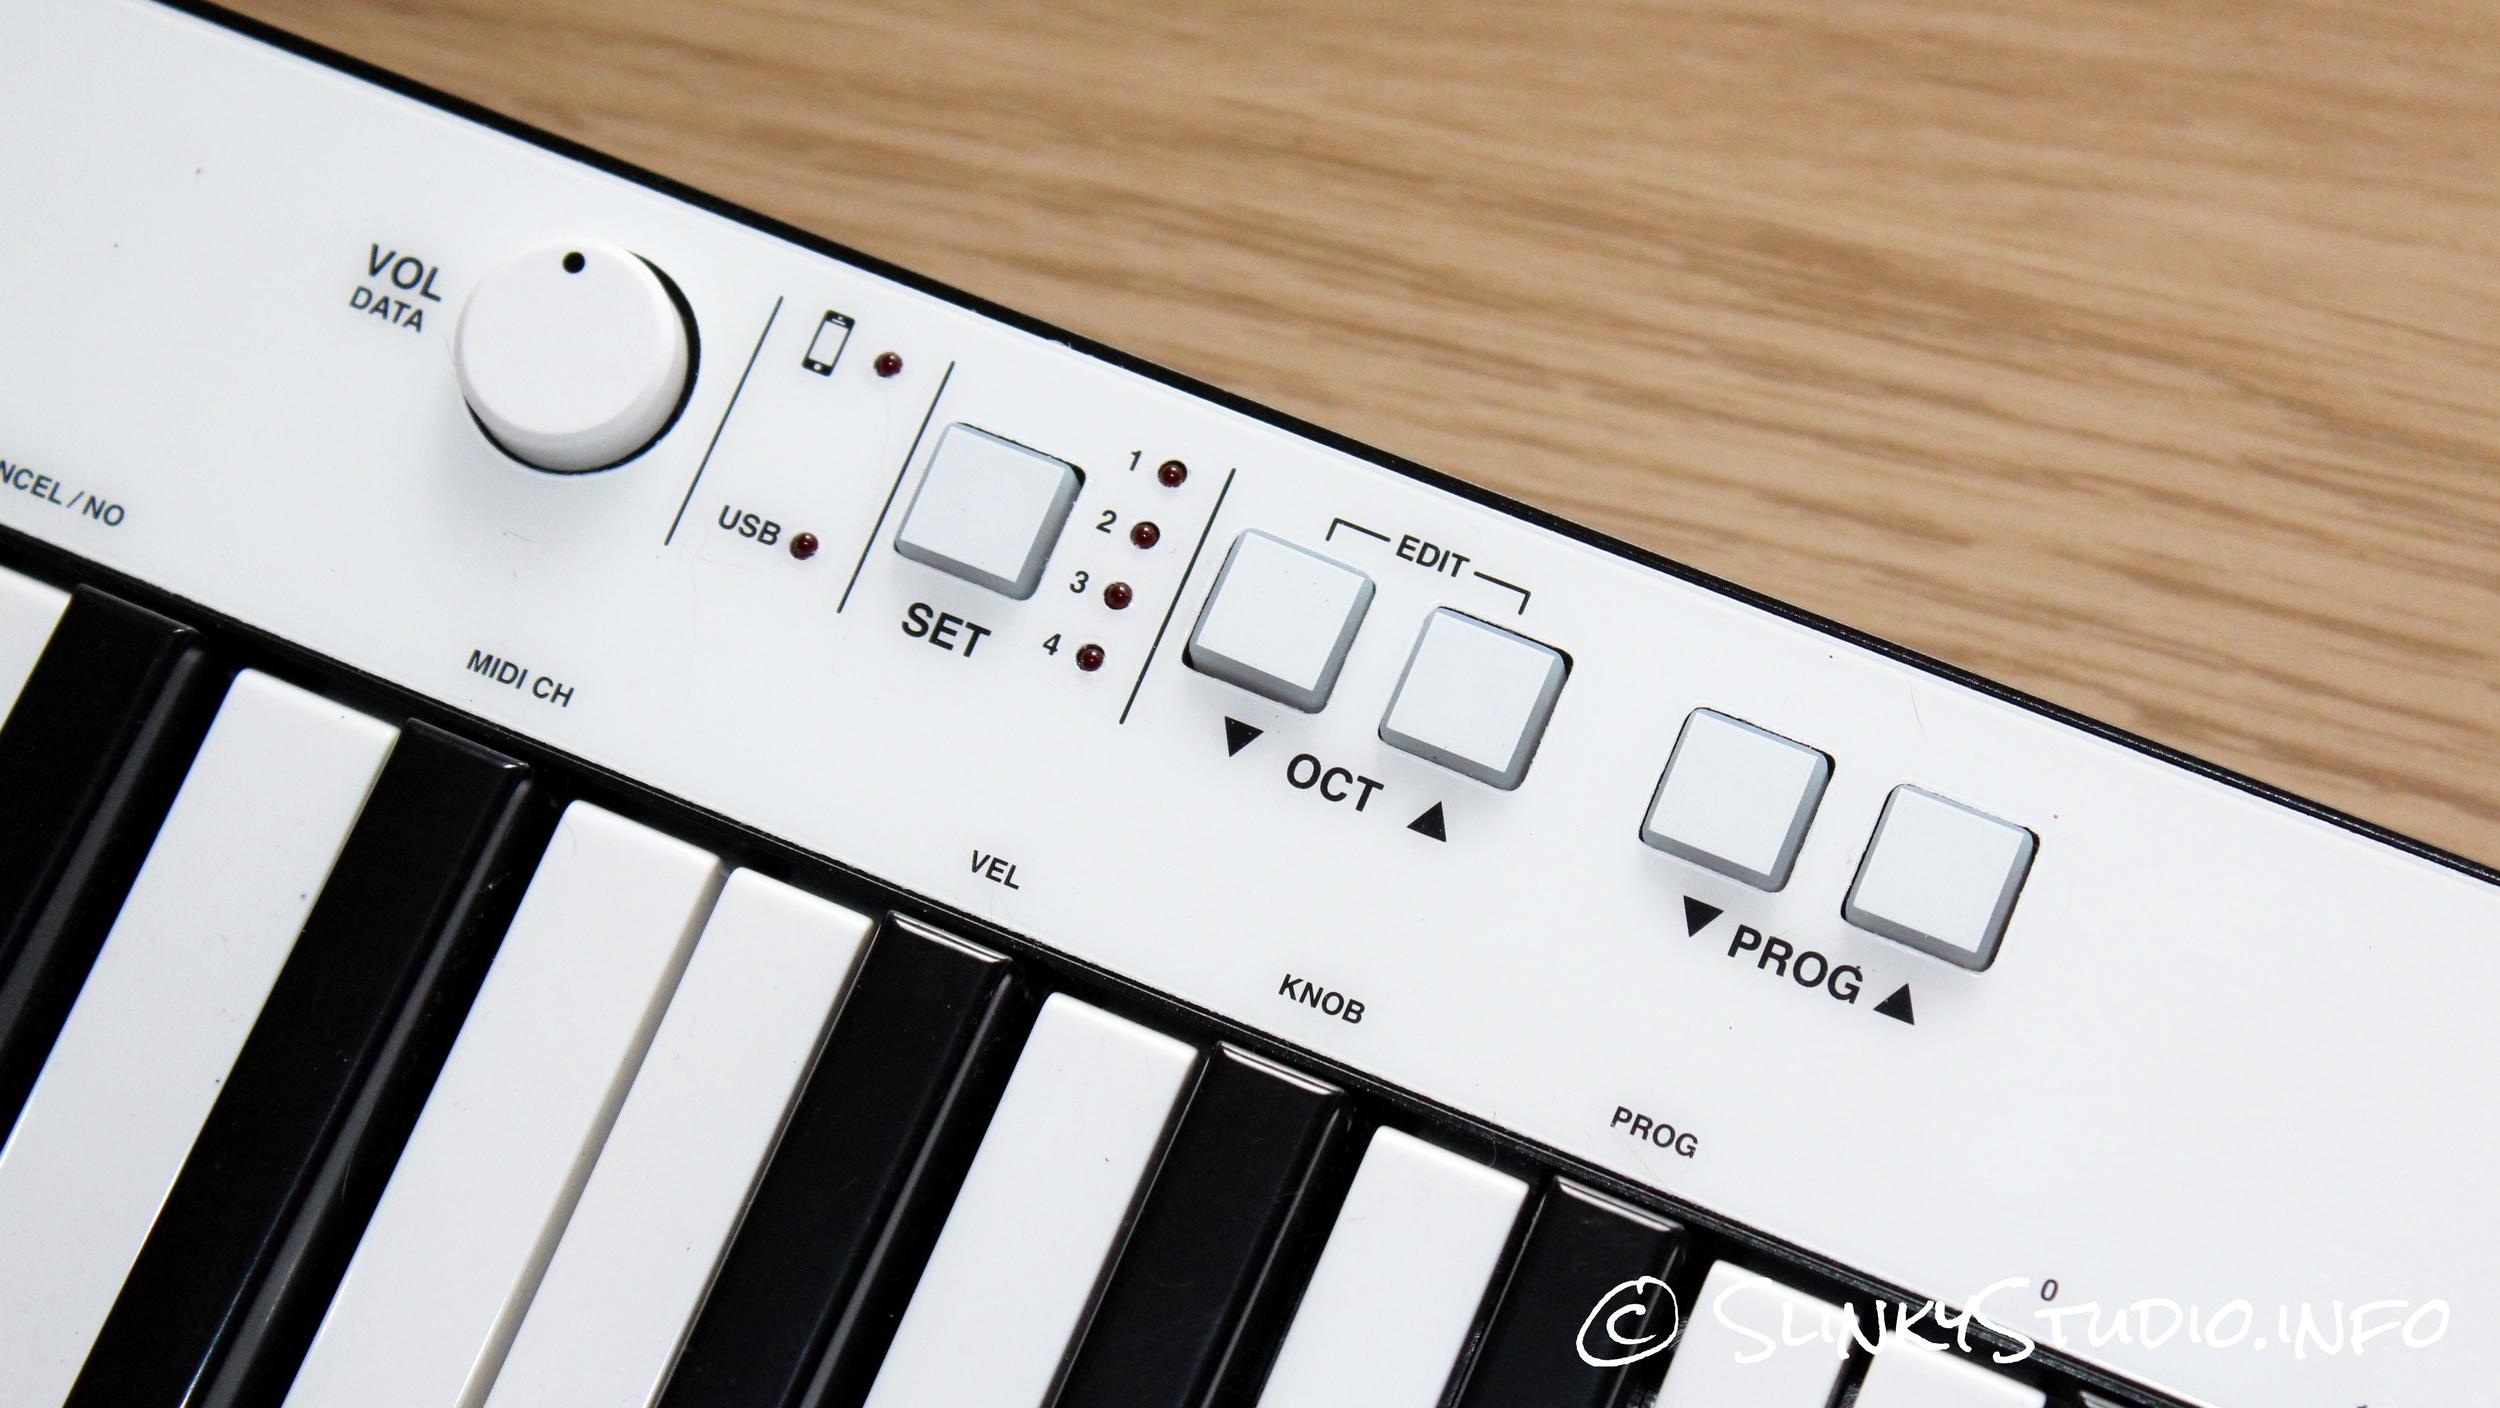 IK Multimedia iRig Keys Pro Button Controls